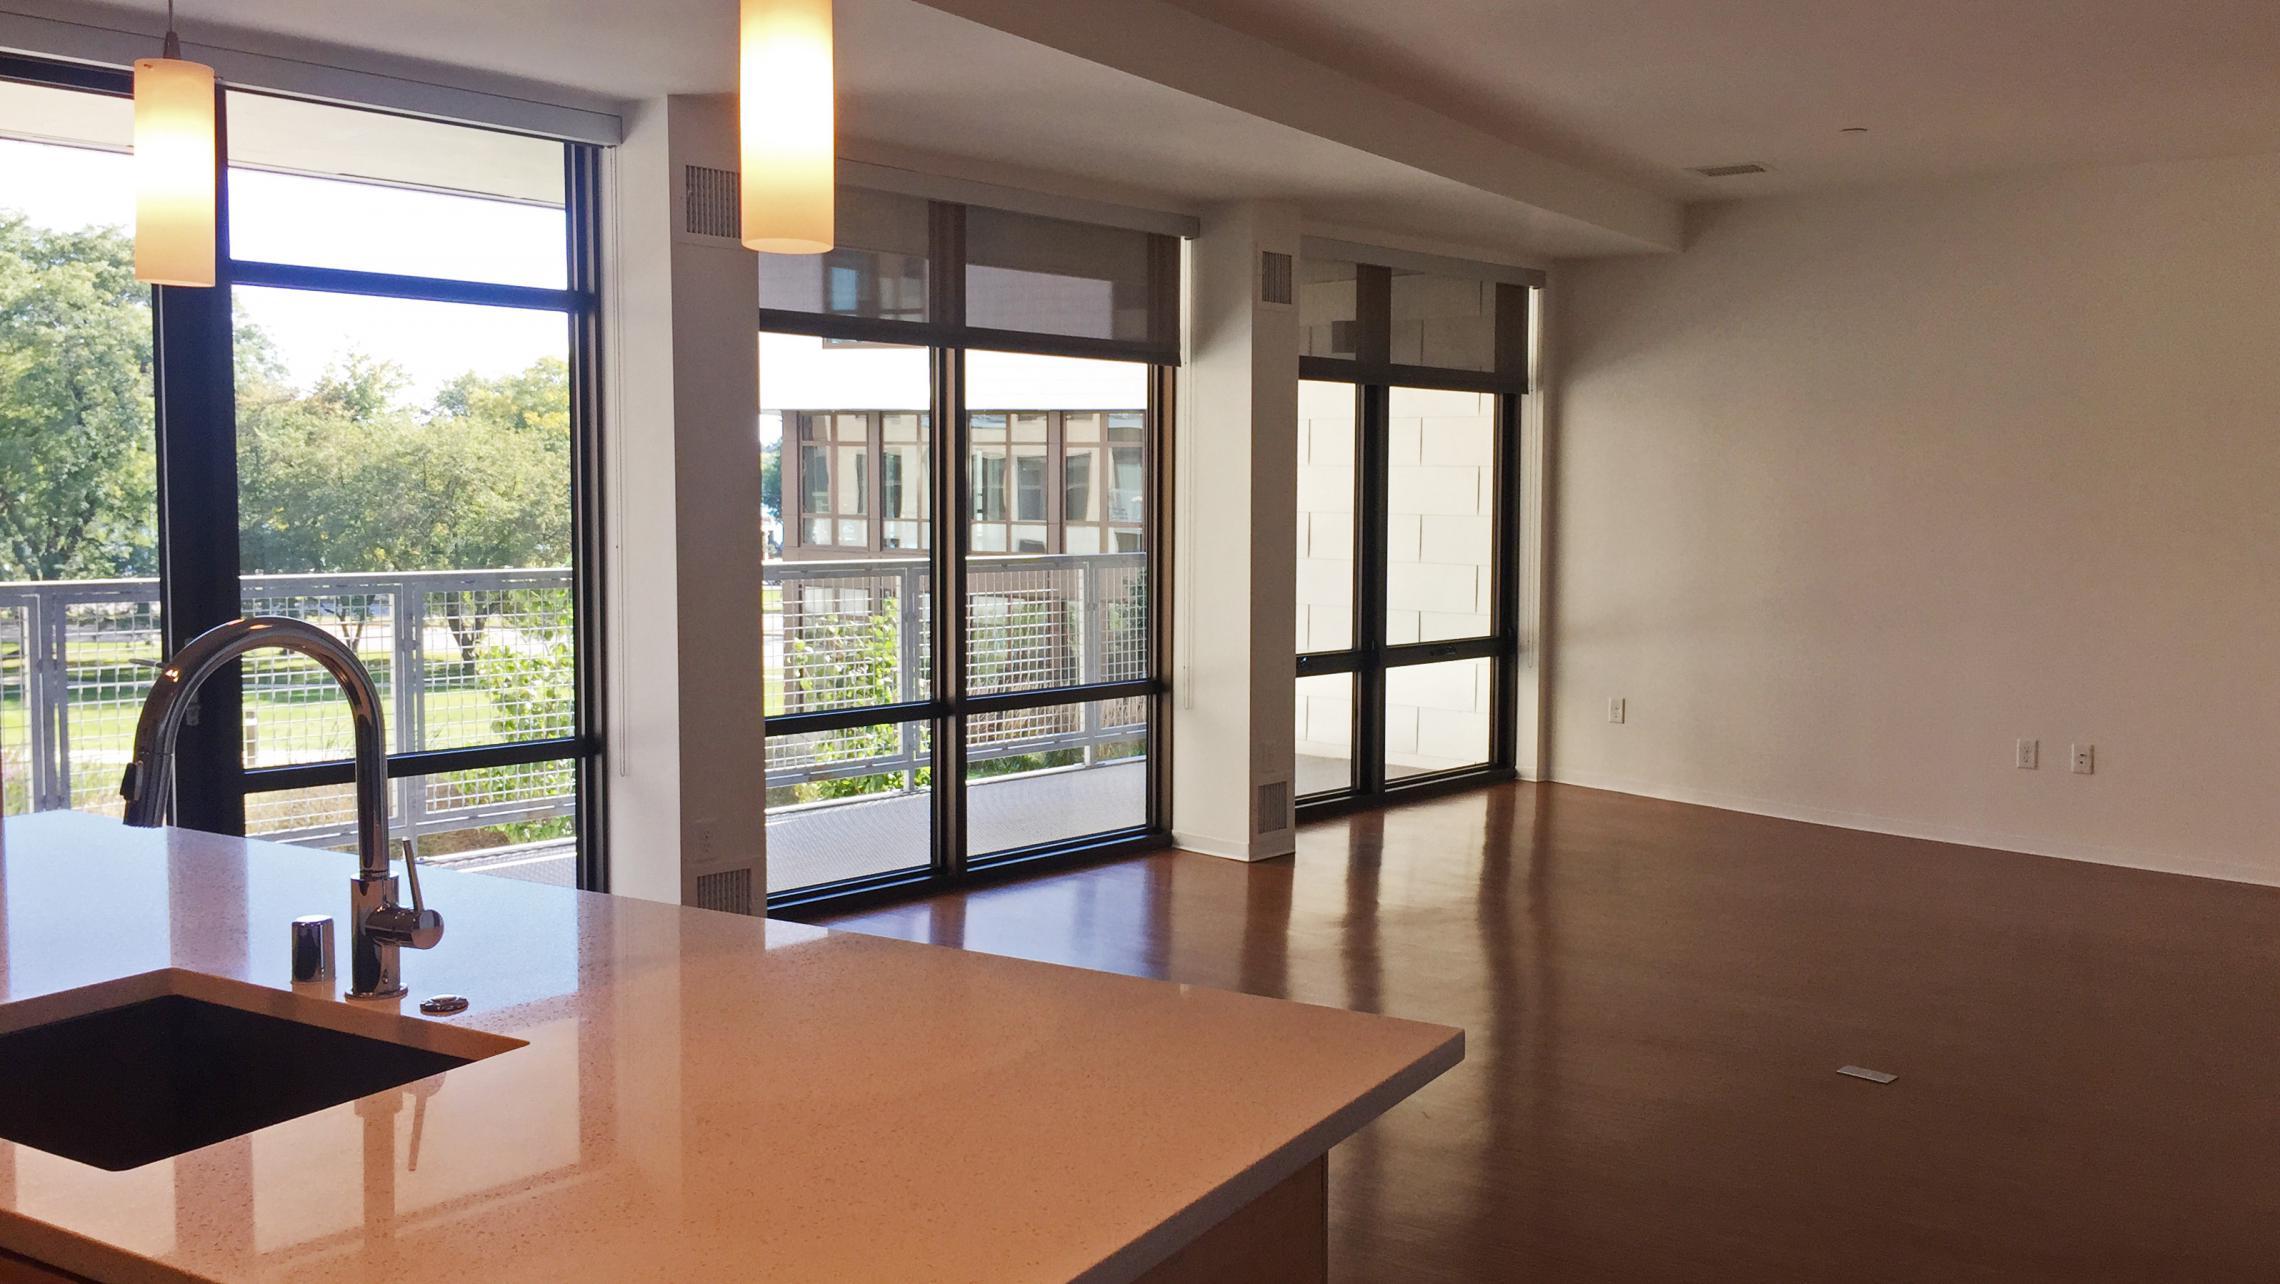 ULI Seven27 Apartment 219 - Living Room Windows